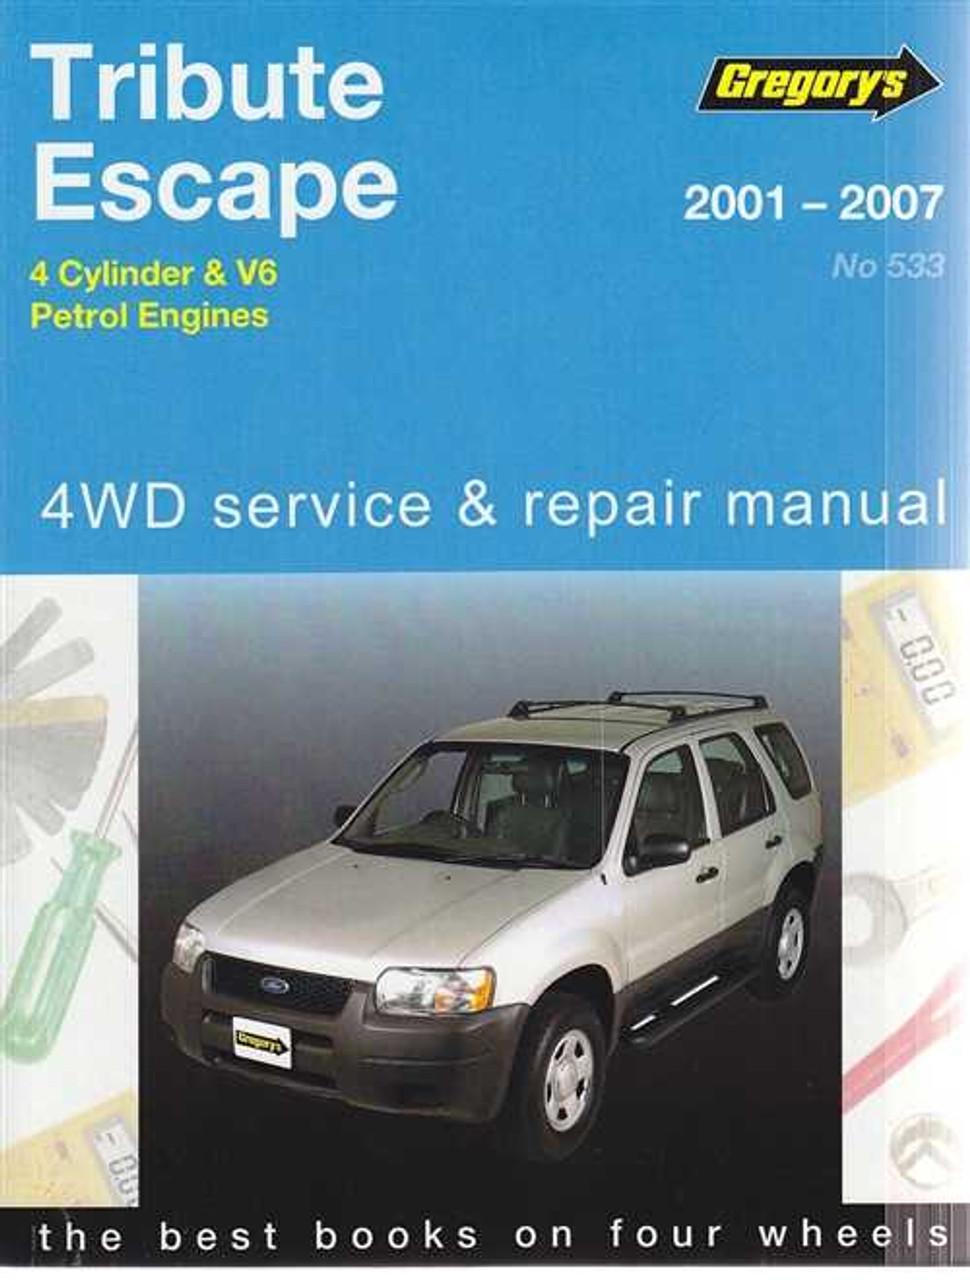 Mazda Tribute Exhaust System Diagram On 2001 Mazda Tribute Engine